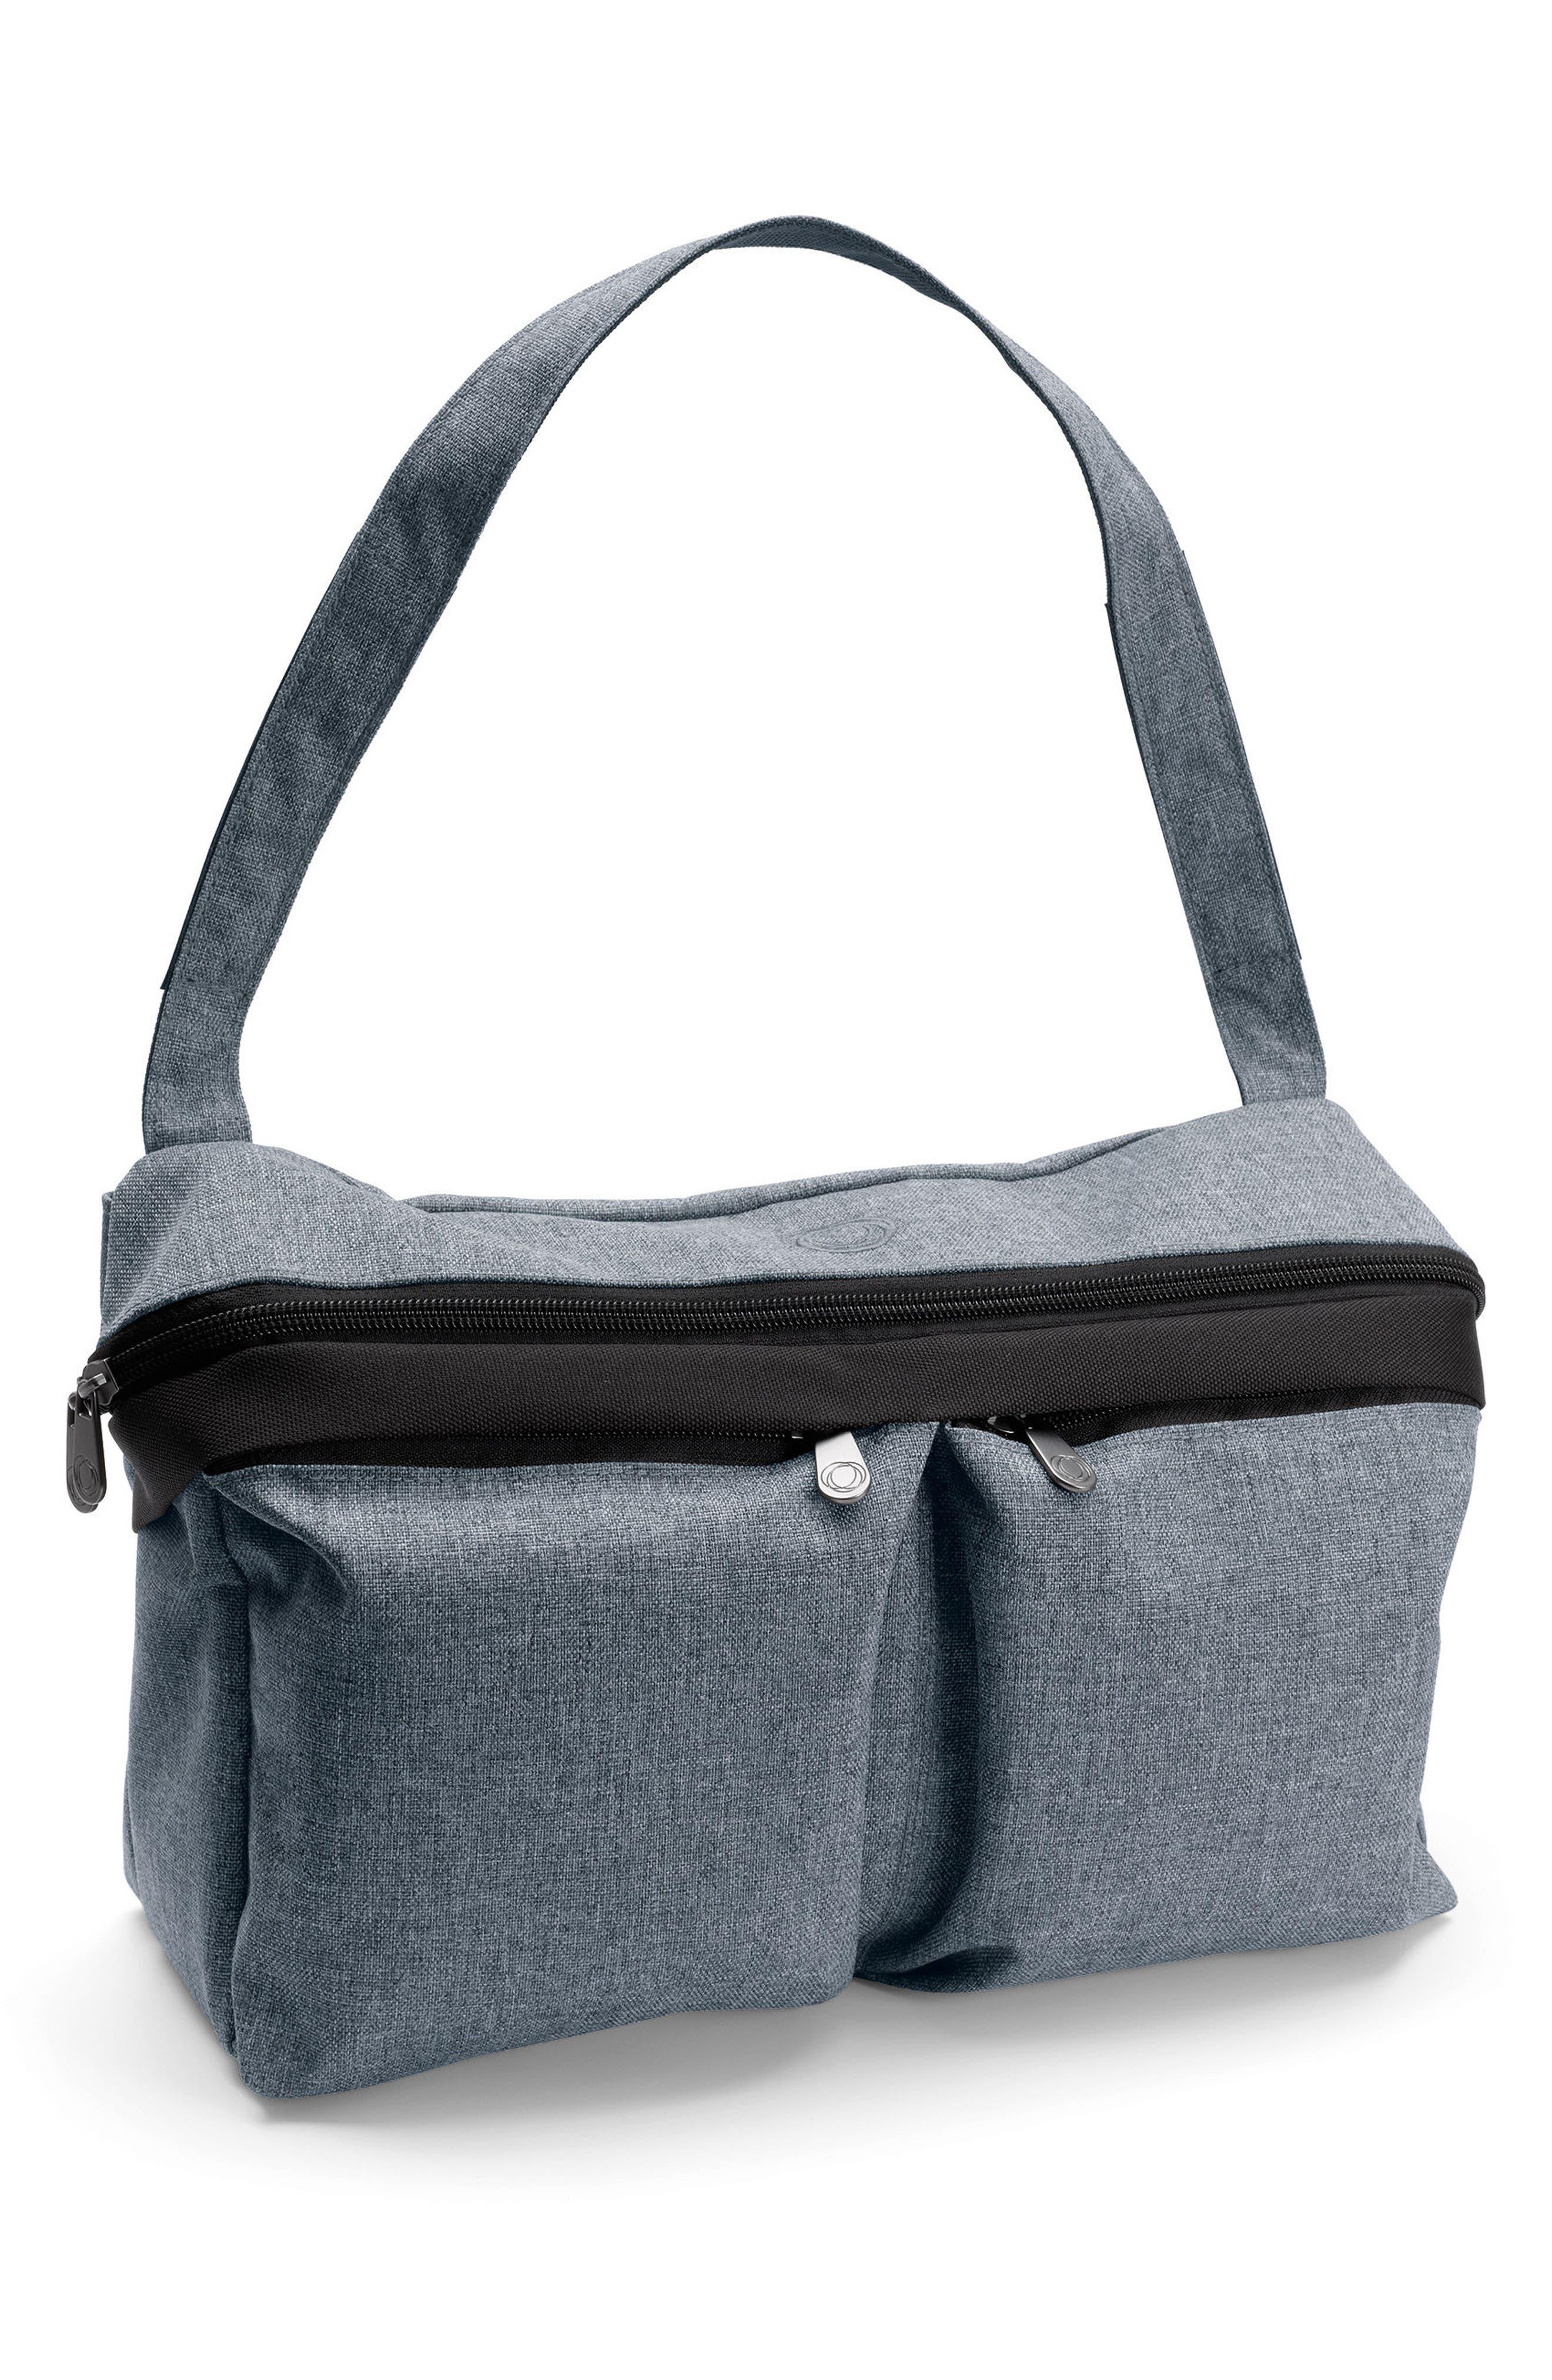 Stroller Organizer Bag,                             Main thumbnail 1, color,                             BLUE MELANGE